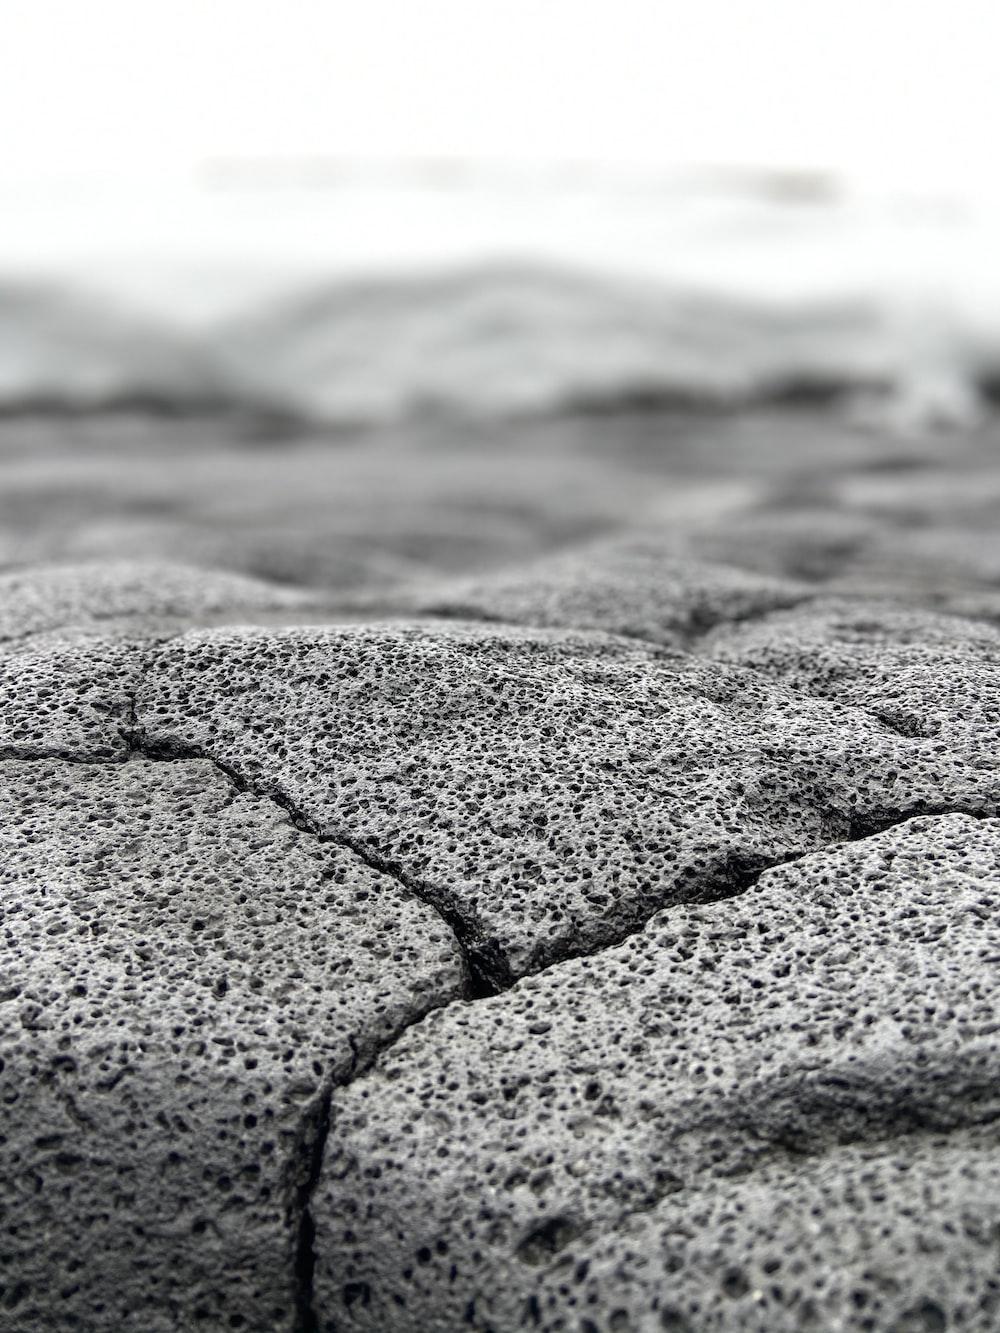 gray stone on seashore during daytime